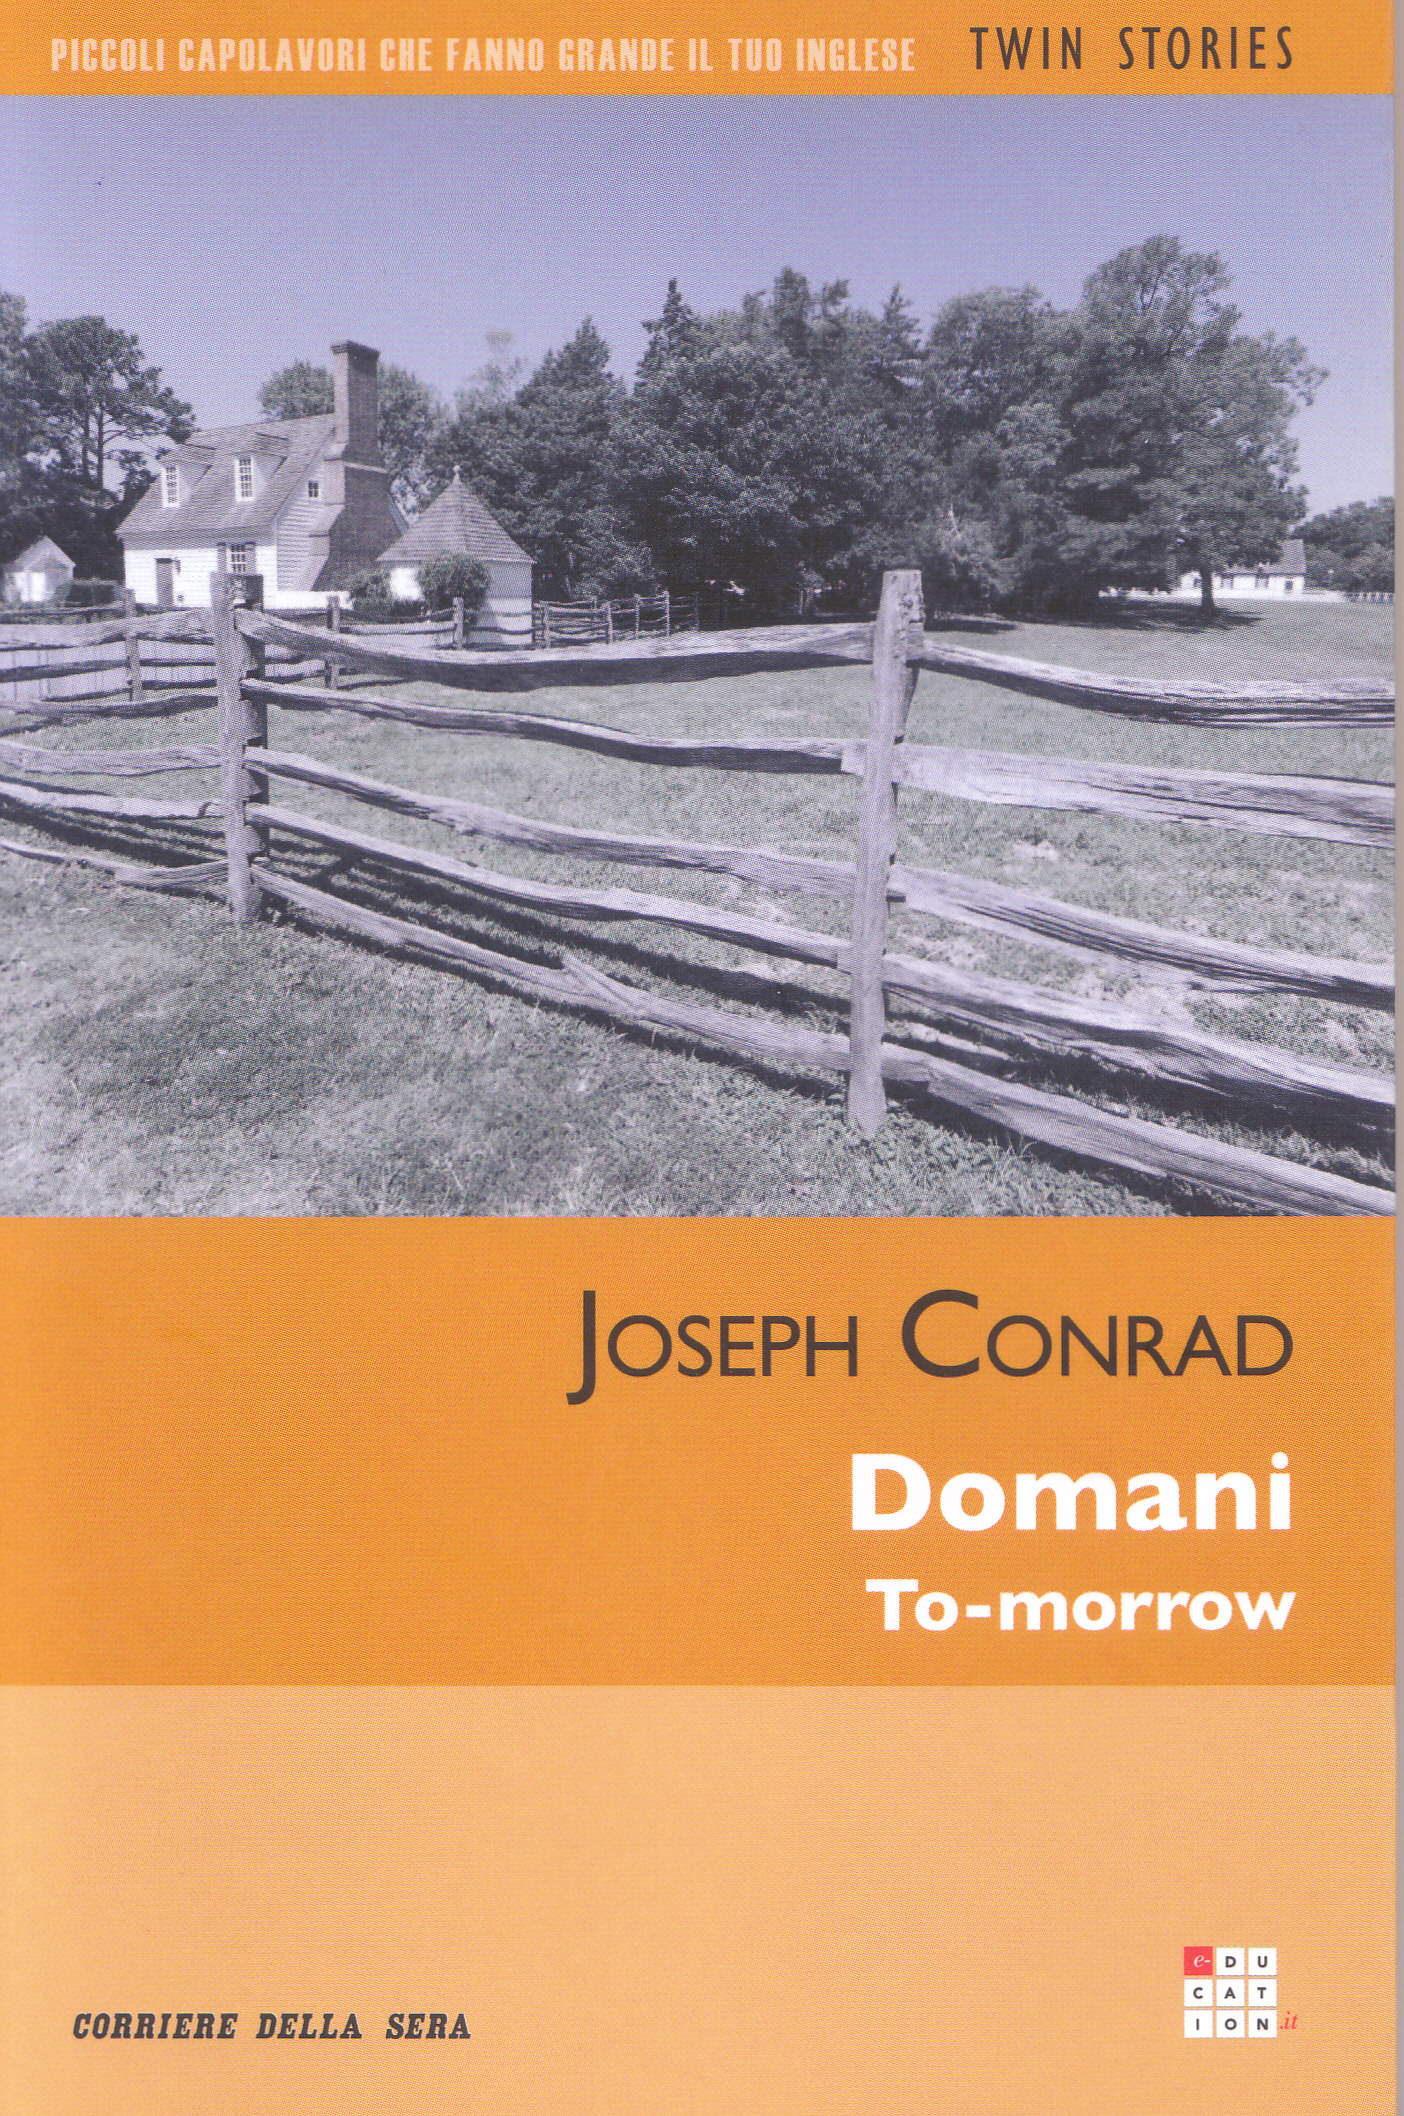 Domani/To-morrow